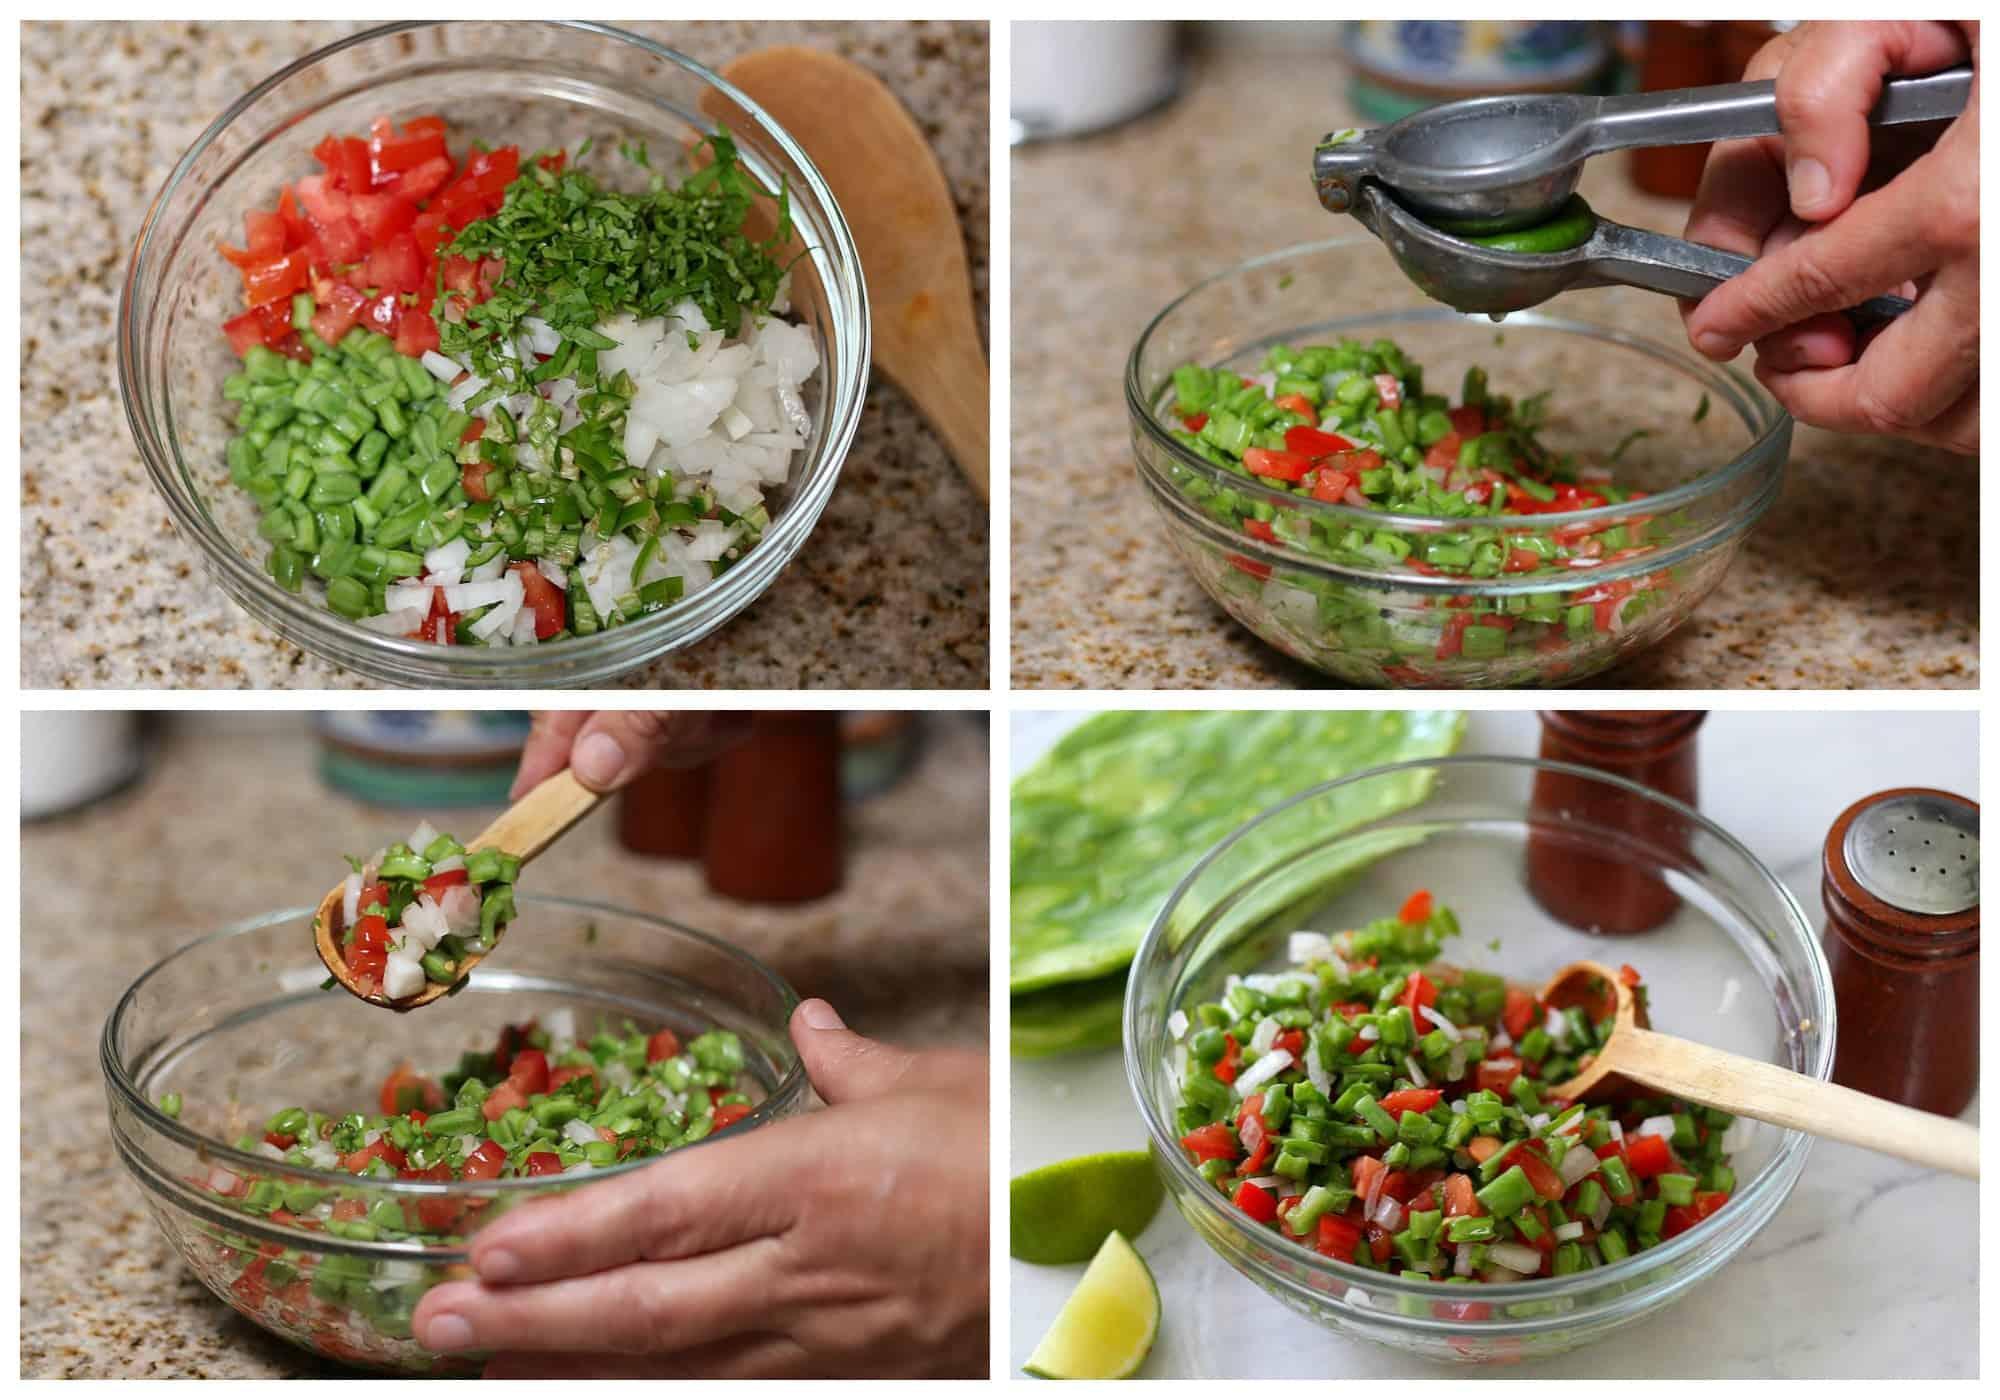 Raw Nopales Salad Process